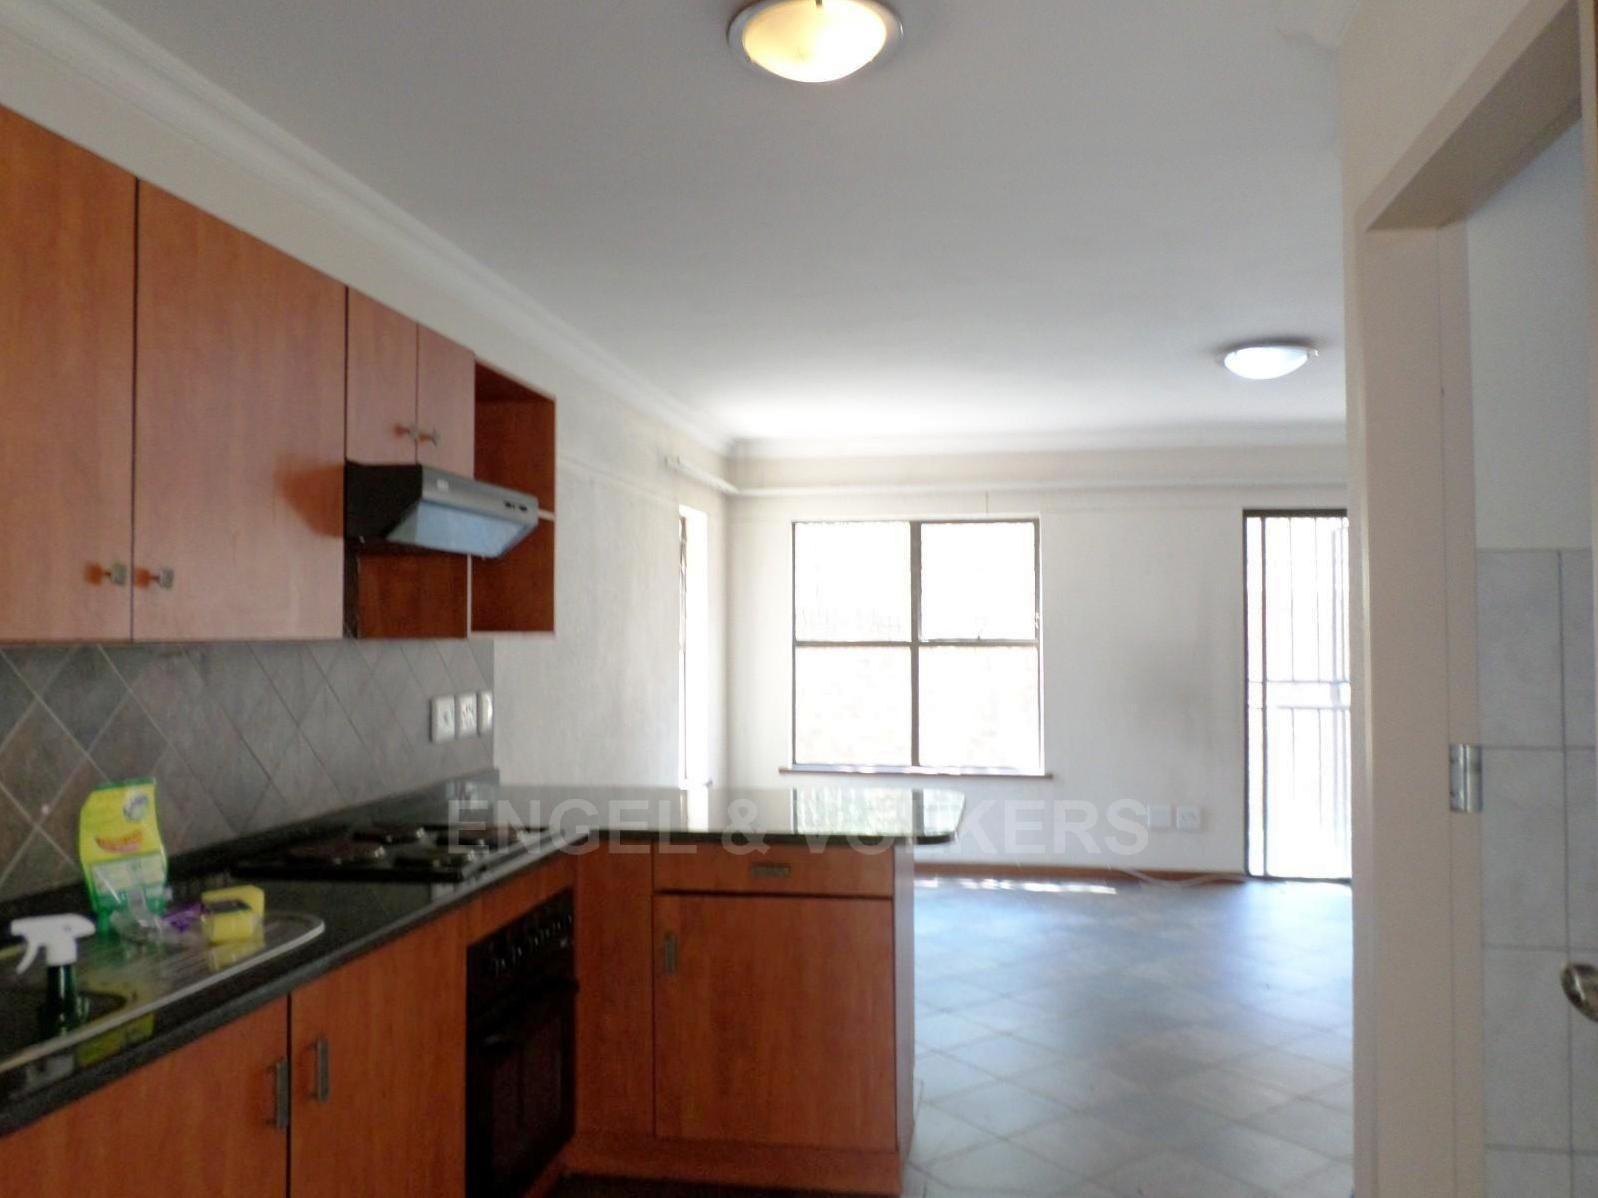 Hatfield property for sale. Ref No: 13259219. Picture no 9